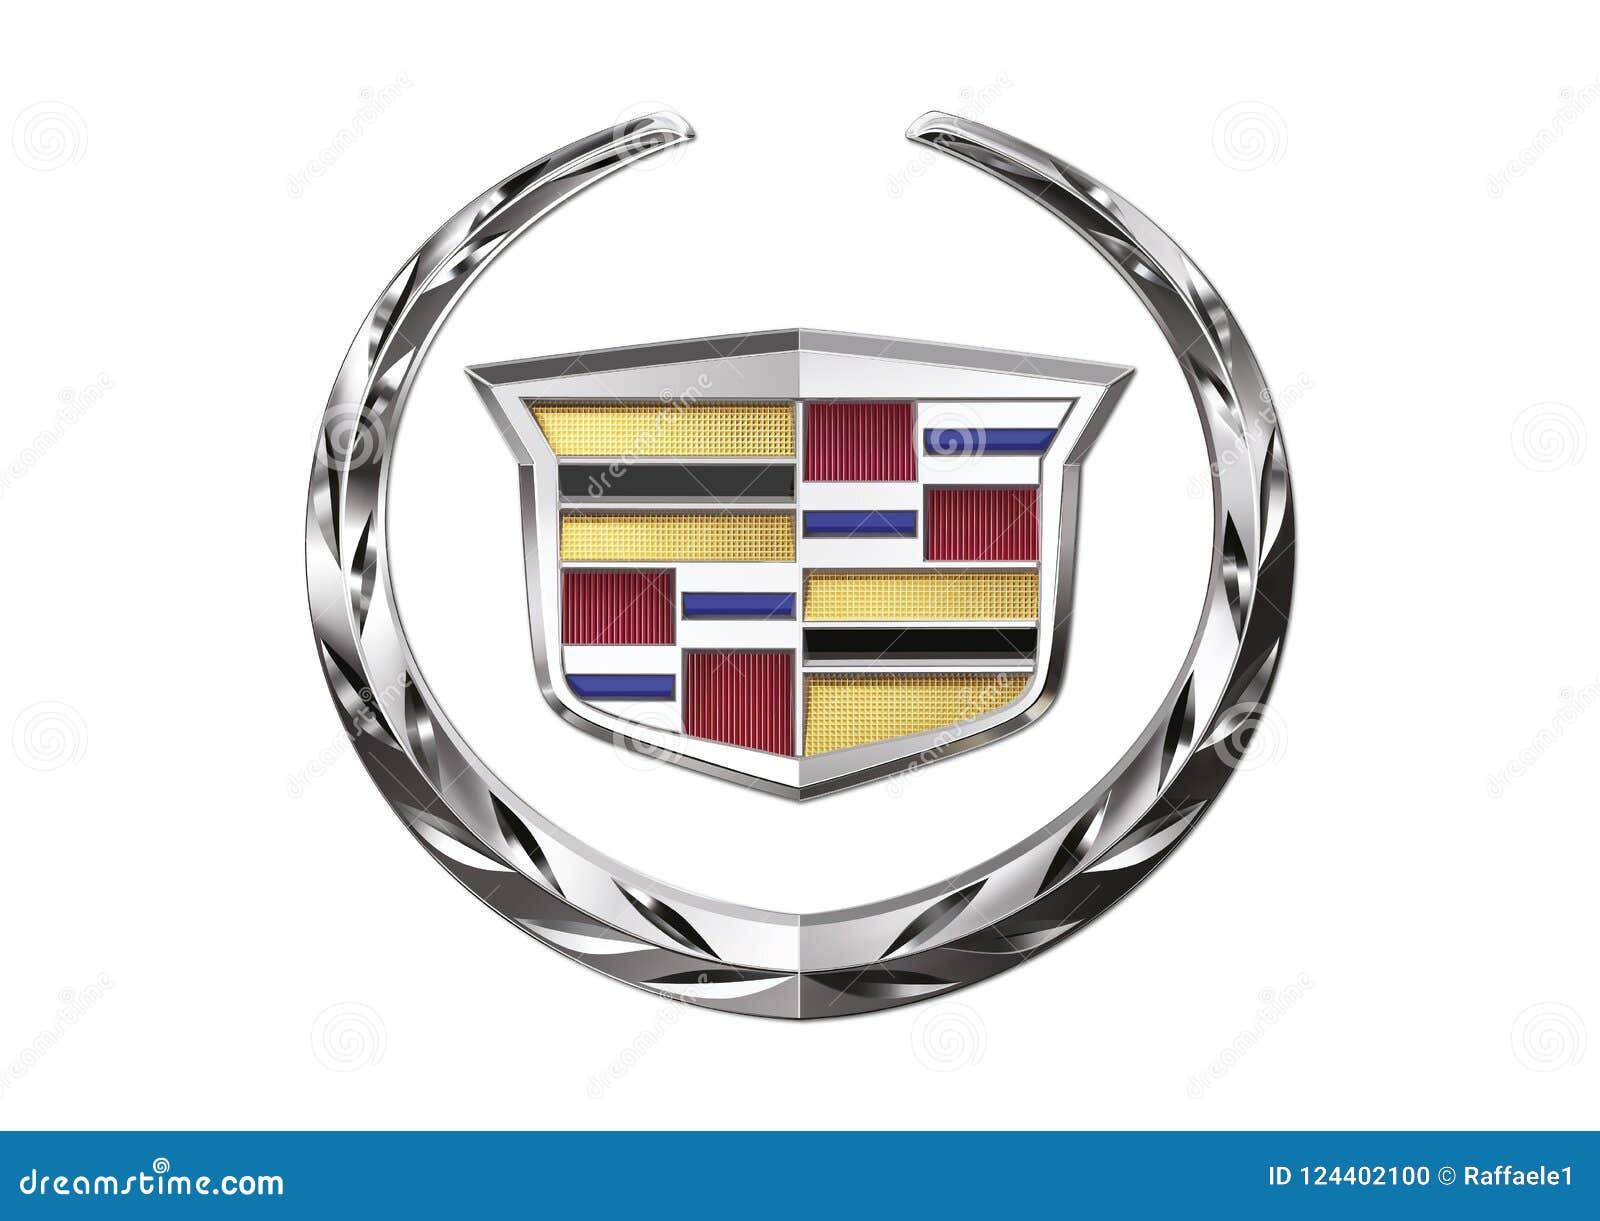 Logo Cadillac Editorial Image Illustration Of Aviable 124402100